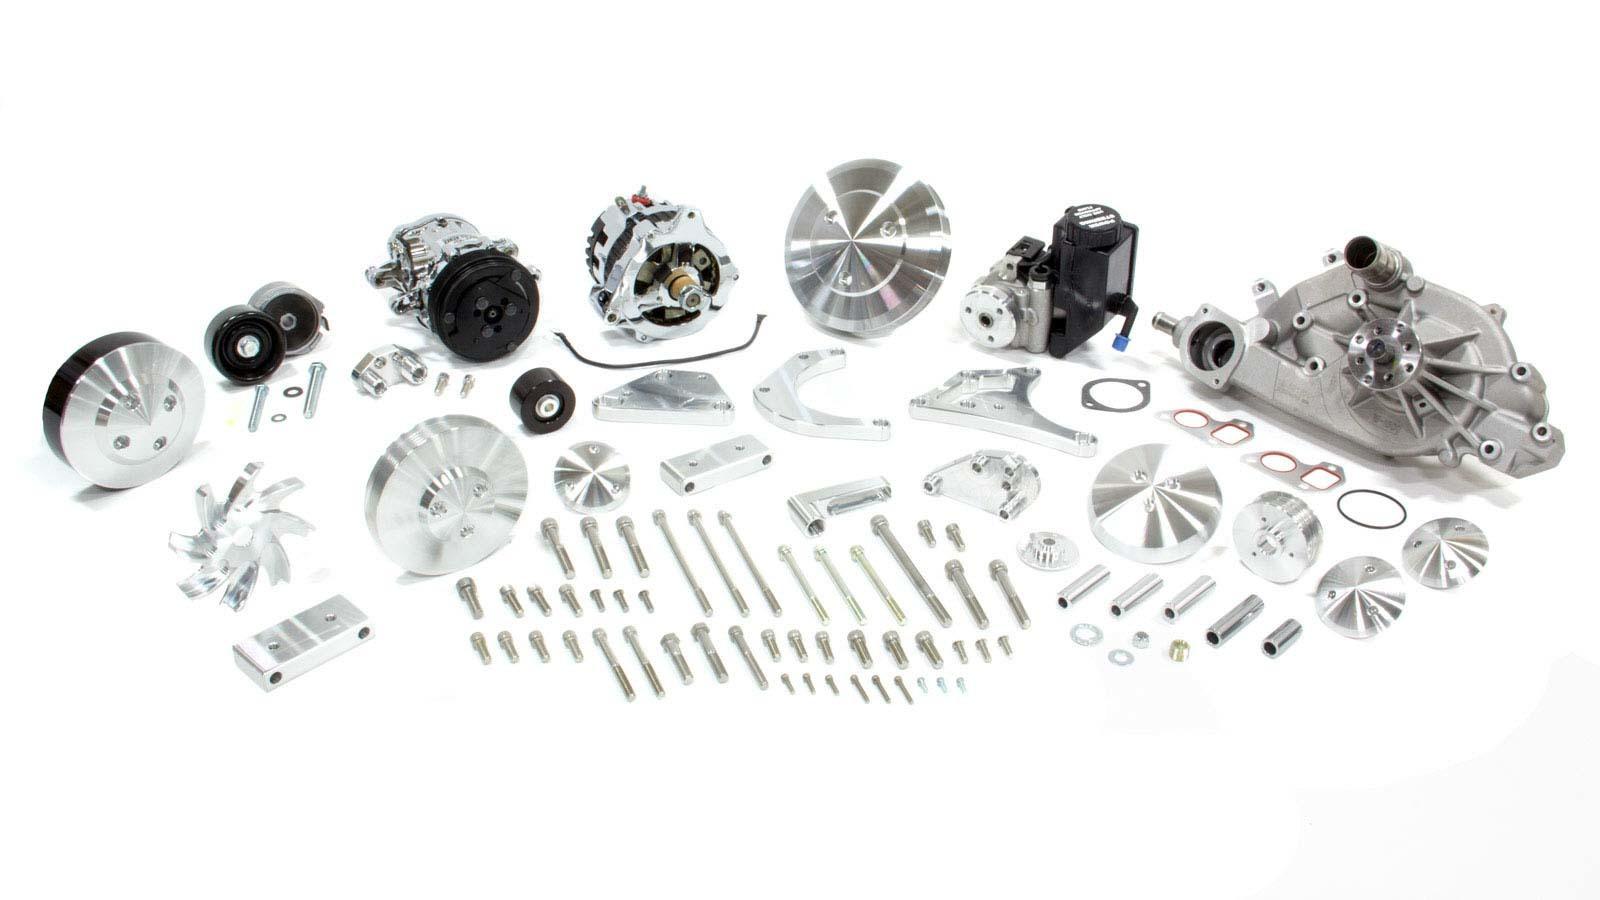 Black Anodize Pulley Kit Kit Small Block Chevy Aluminum Economy 10 Rib Serpentine Water Pump